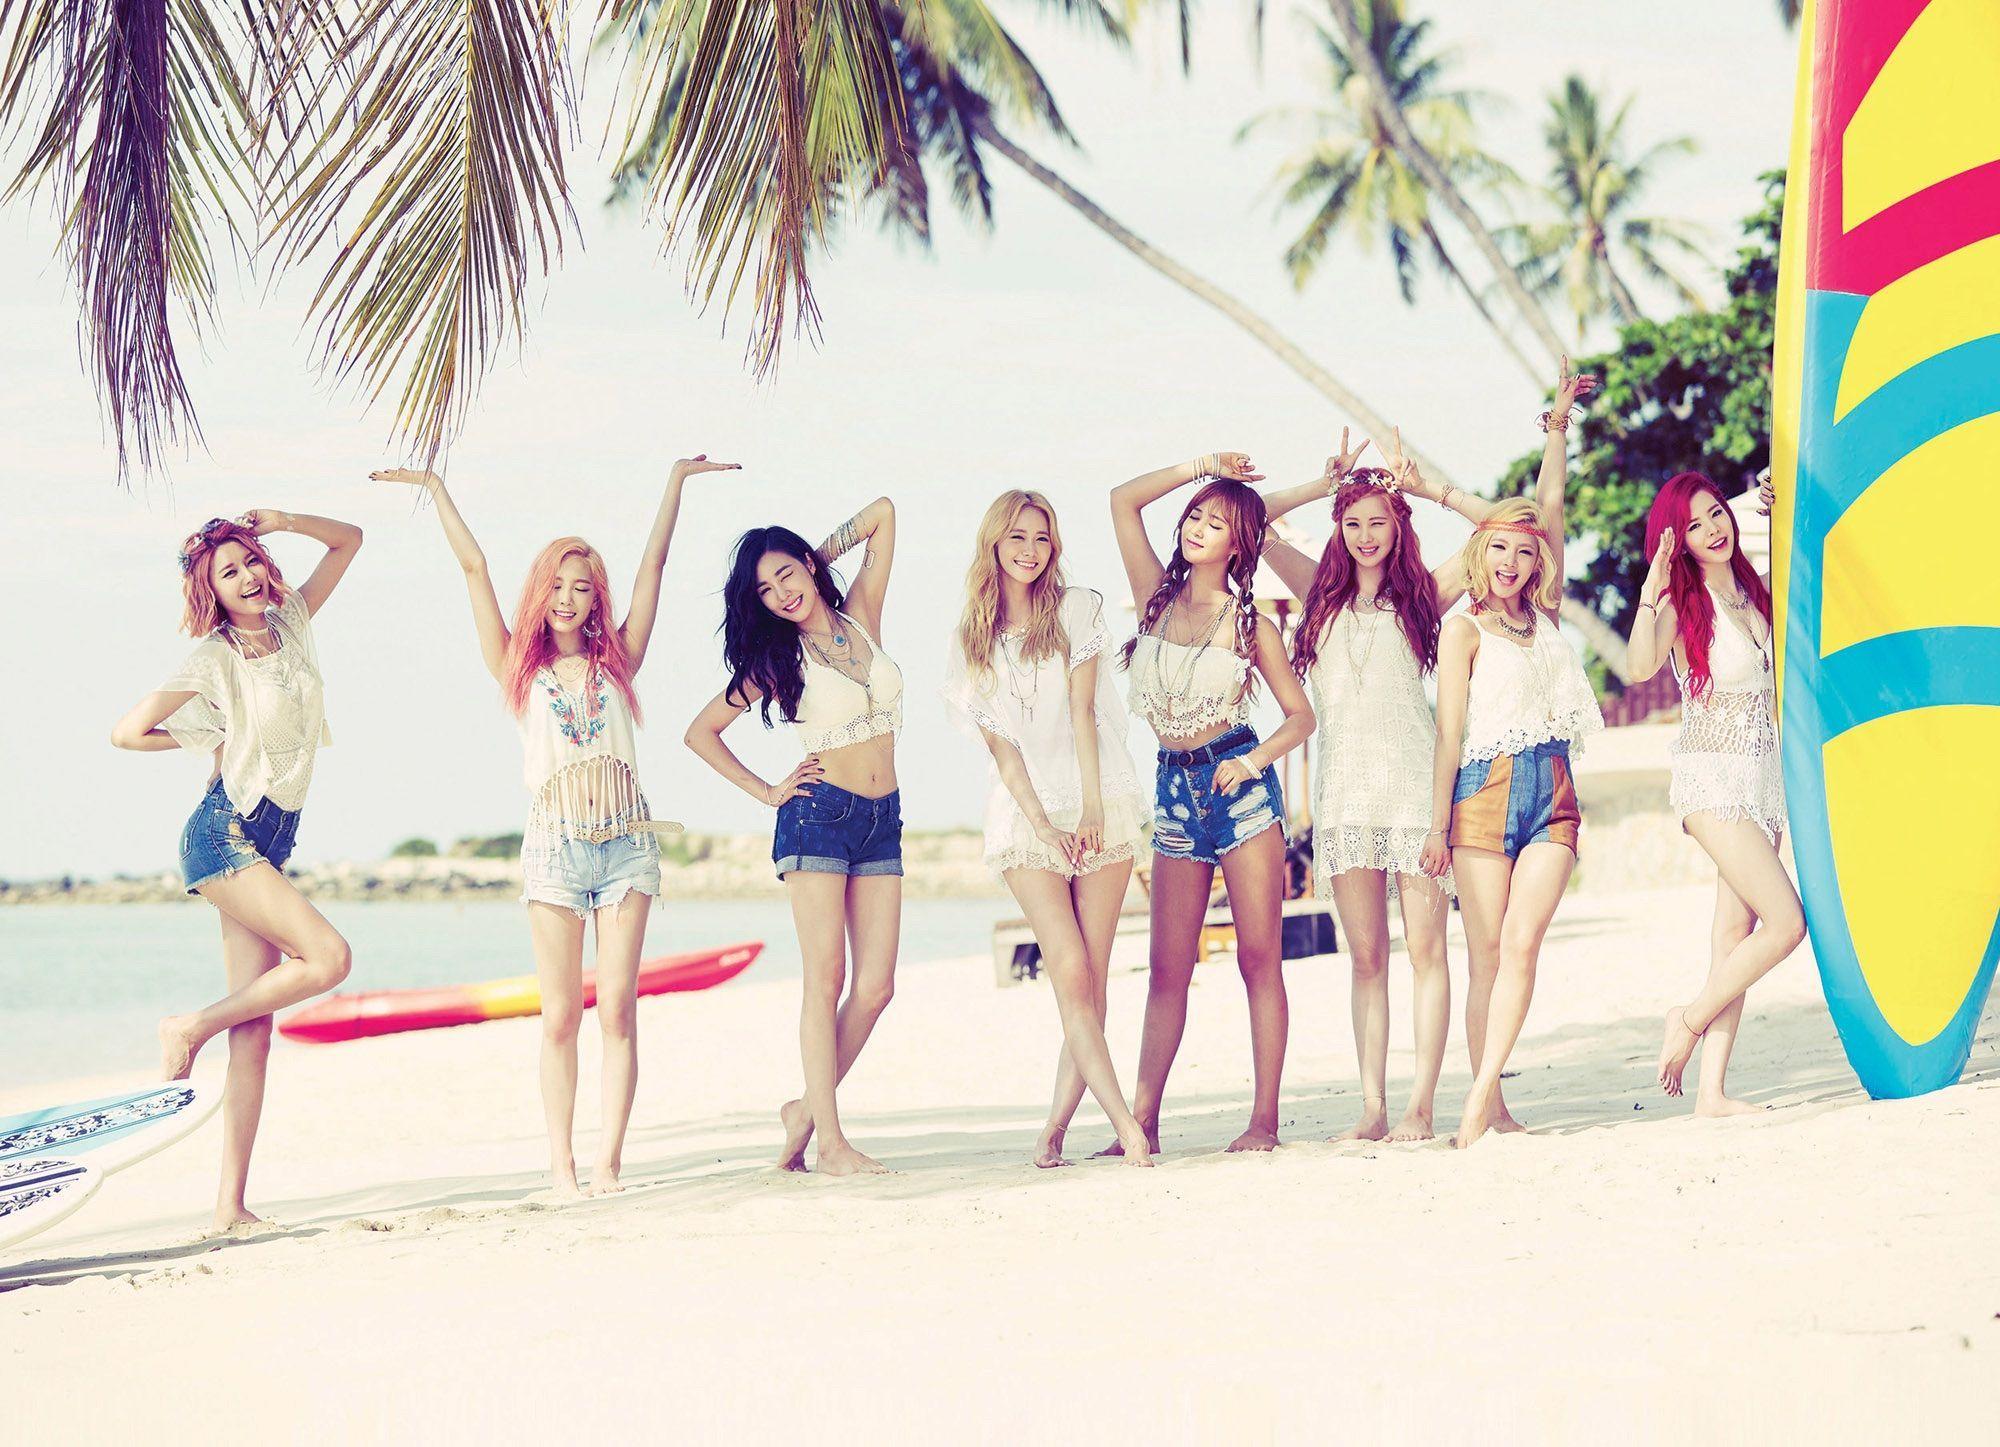 What Is Your Kpop Wallpaper Allkpop Forums Girls Generation Girls Generation Snsd